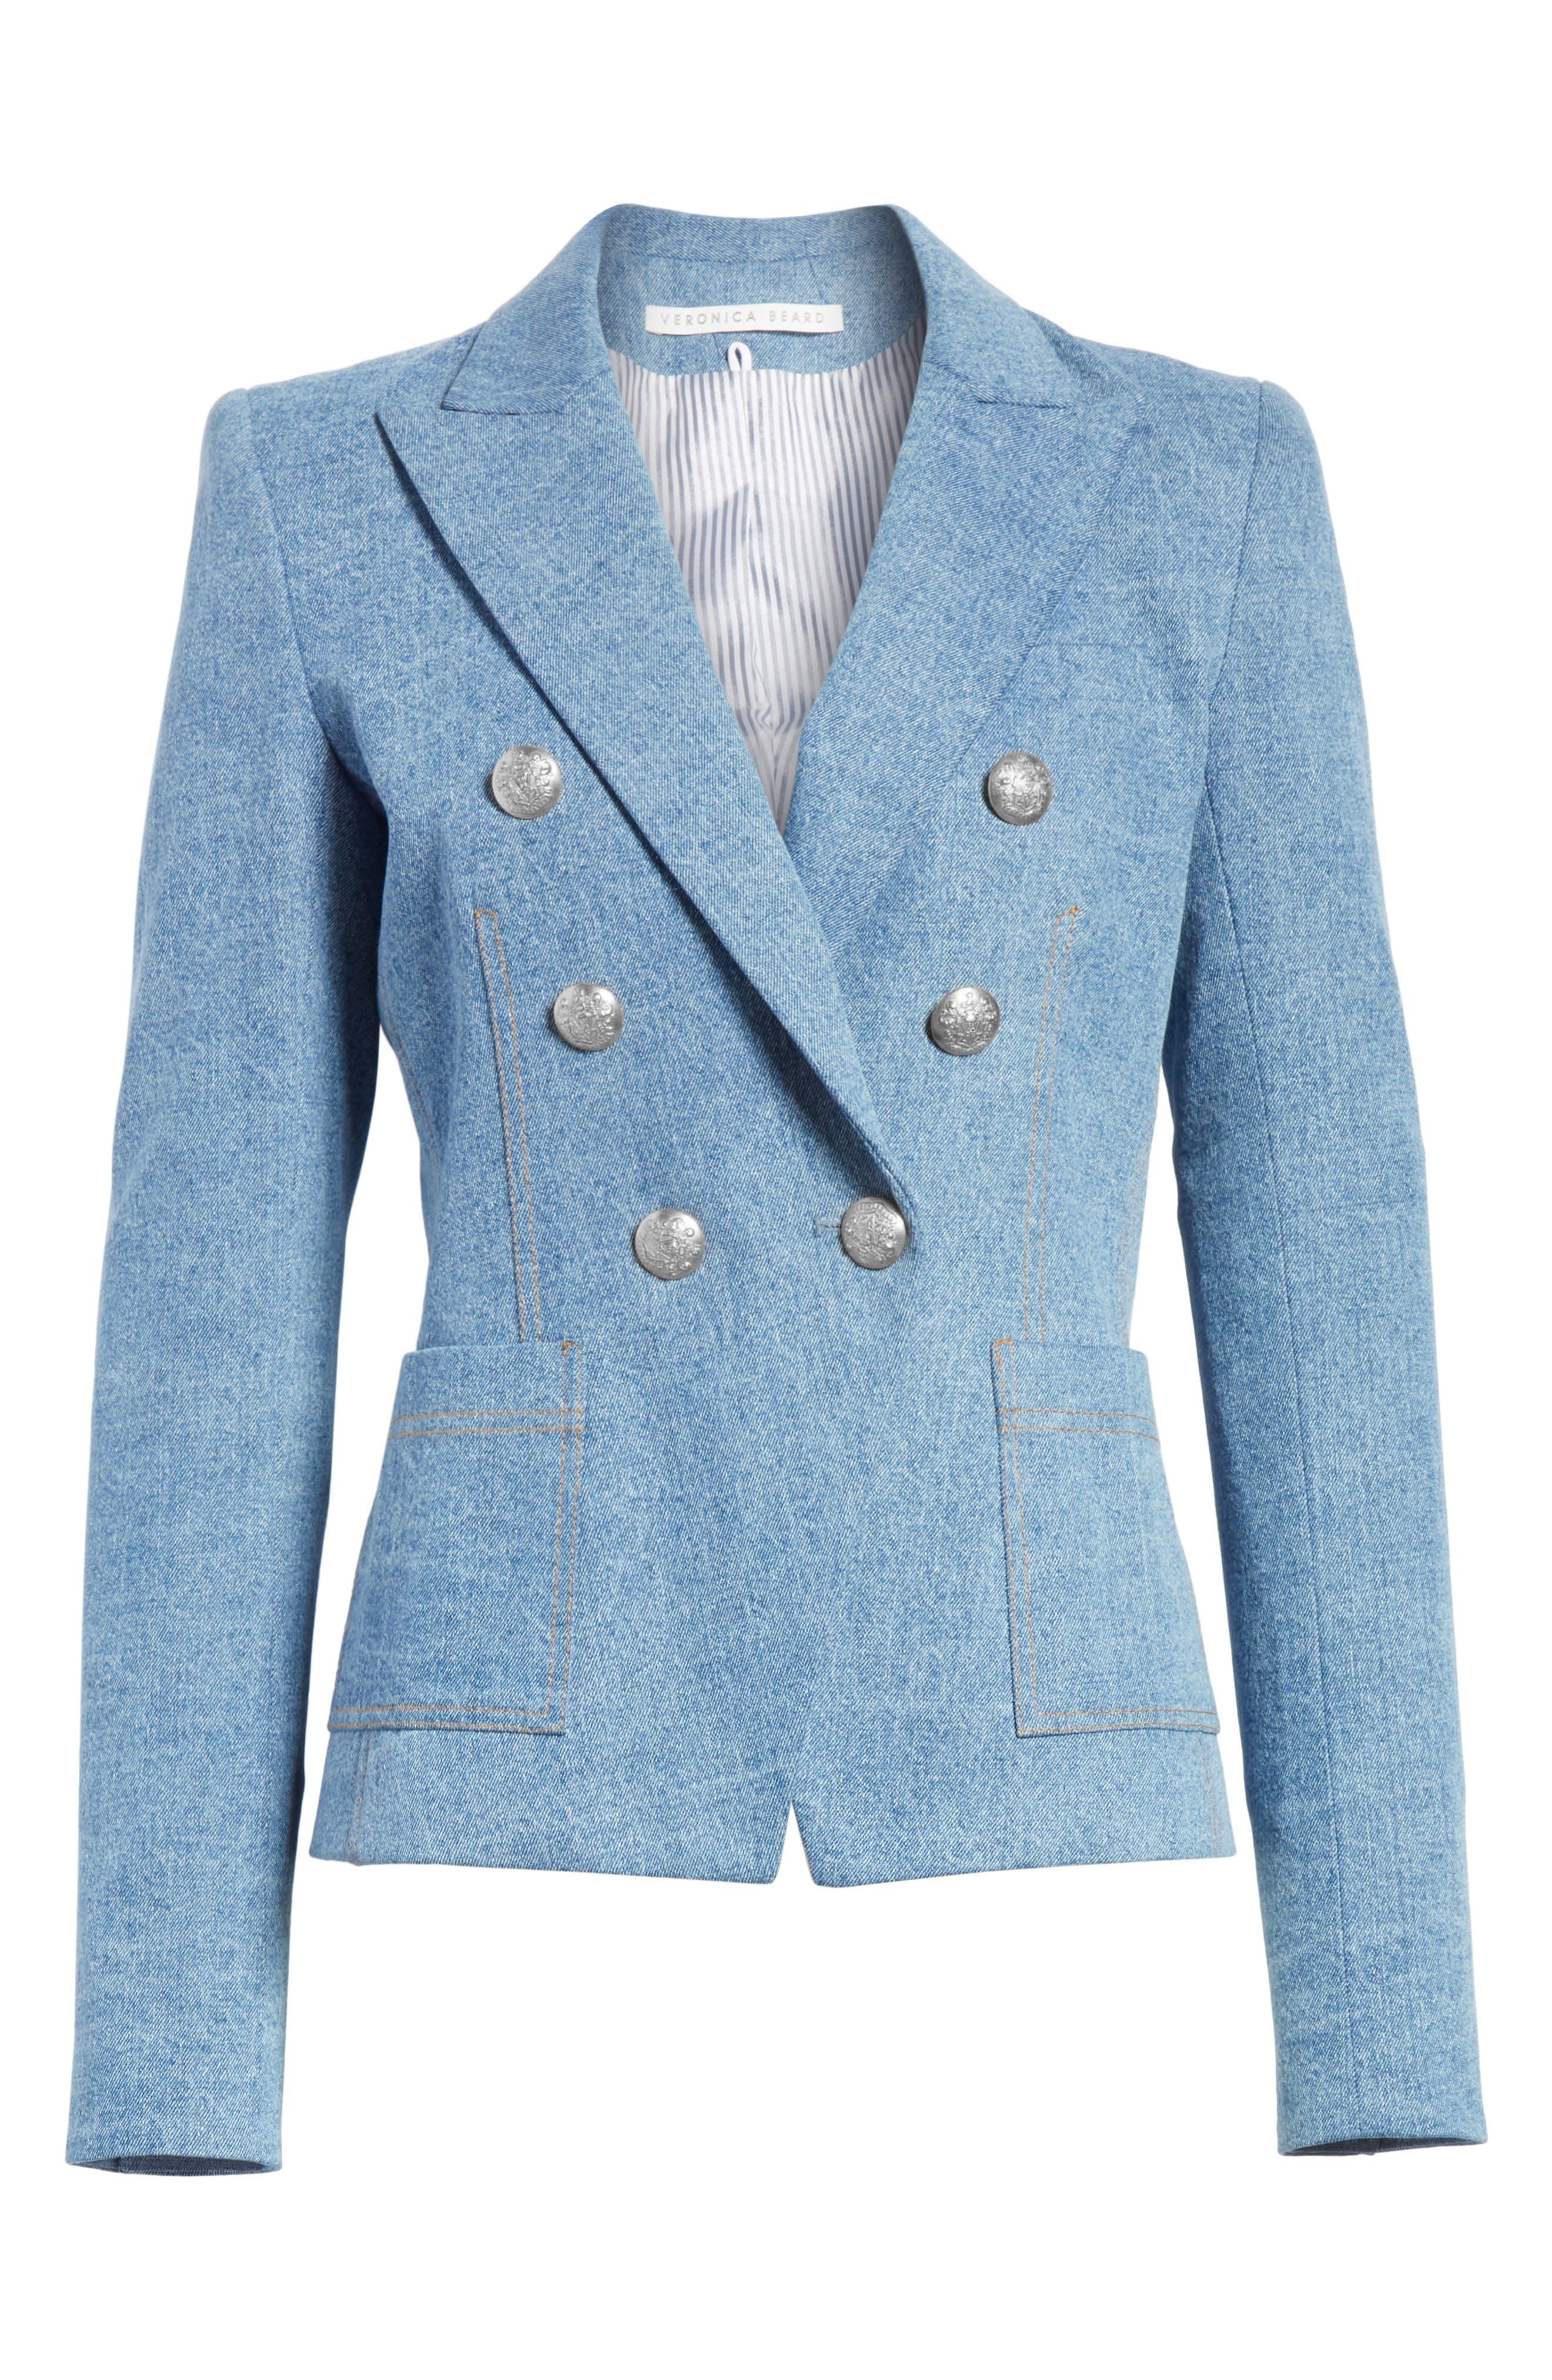 VERONICA BEARD Caden Denim Dickey Jacket, Main, color, MID BLUE